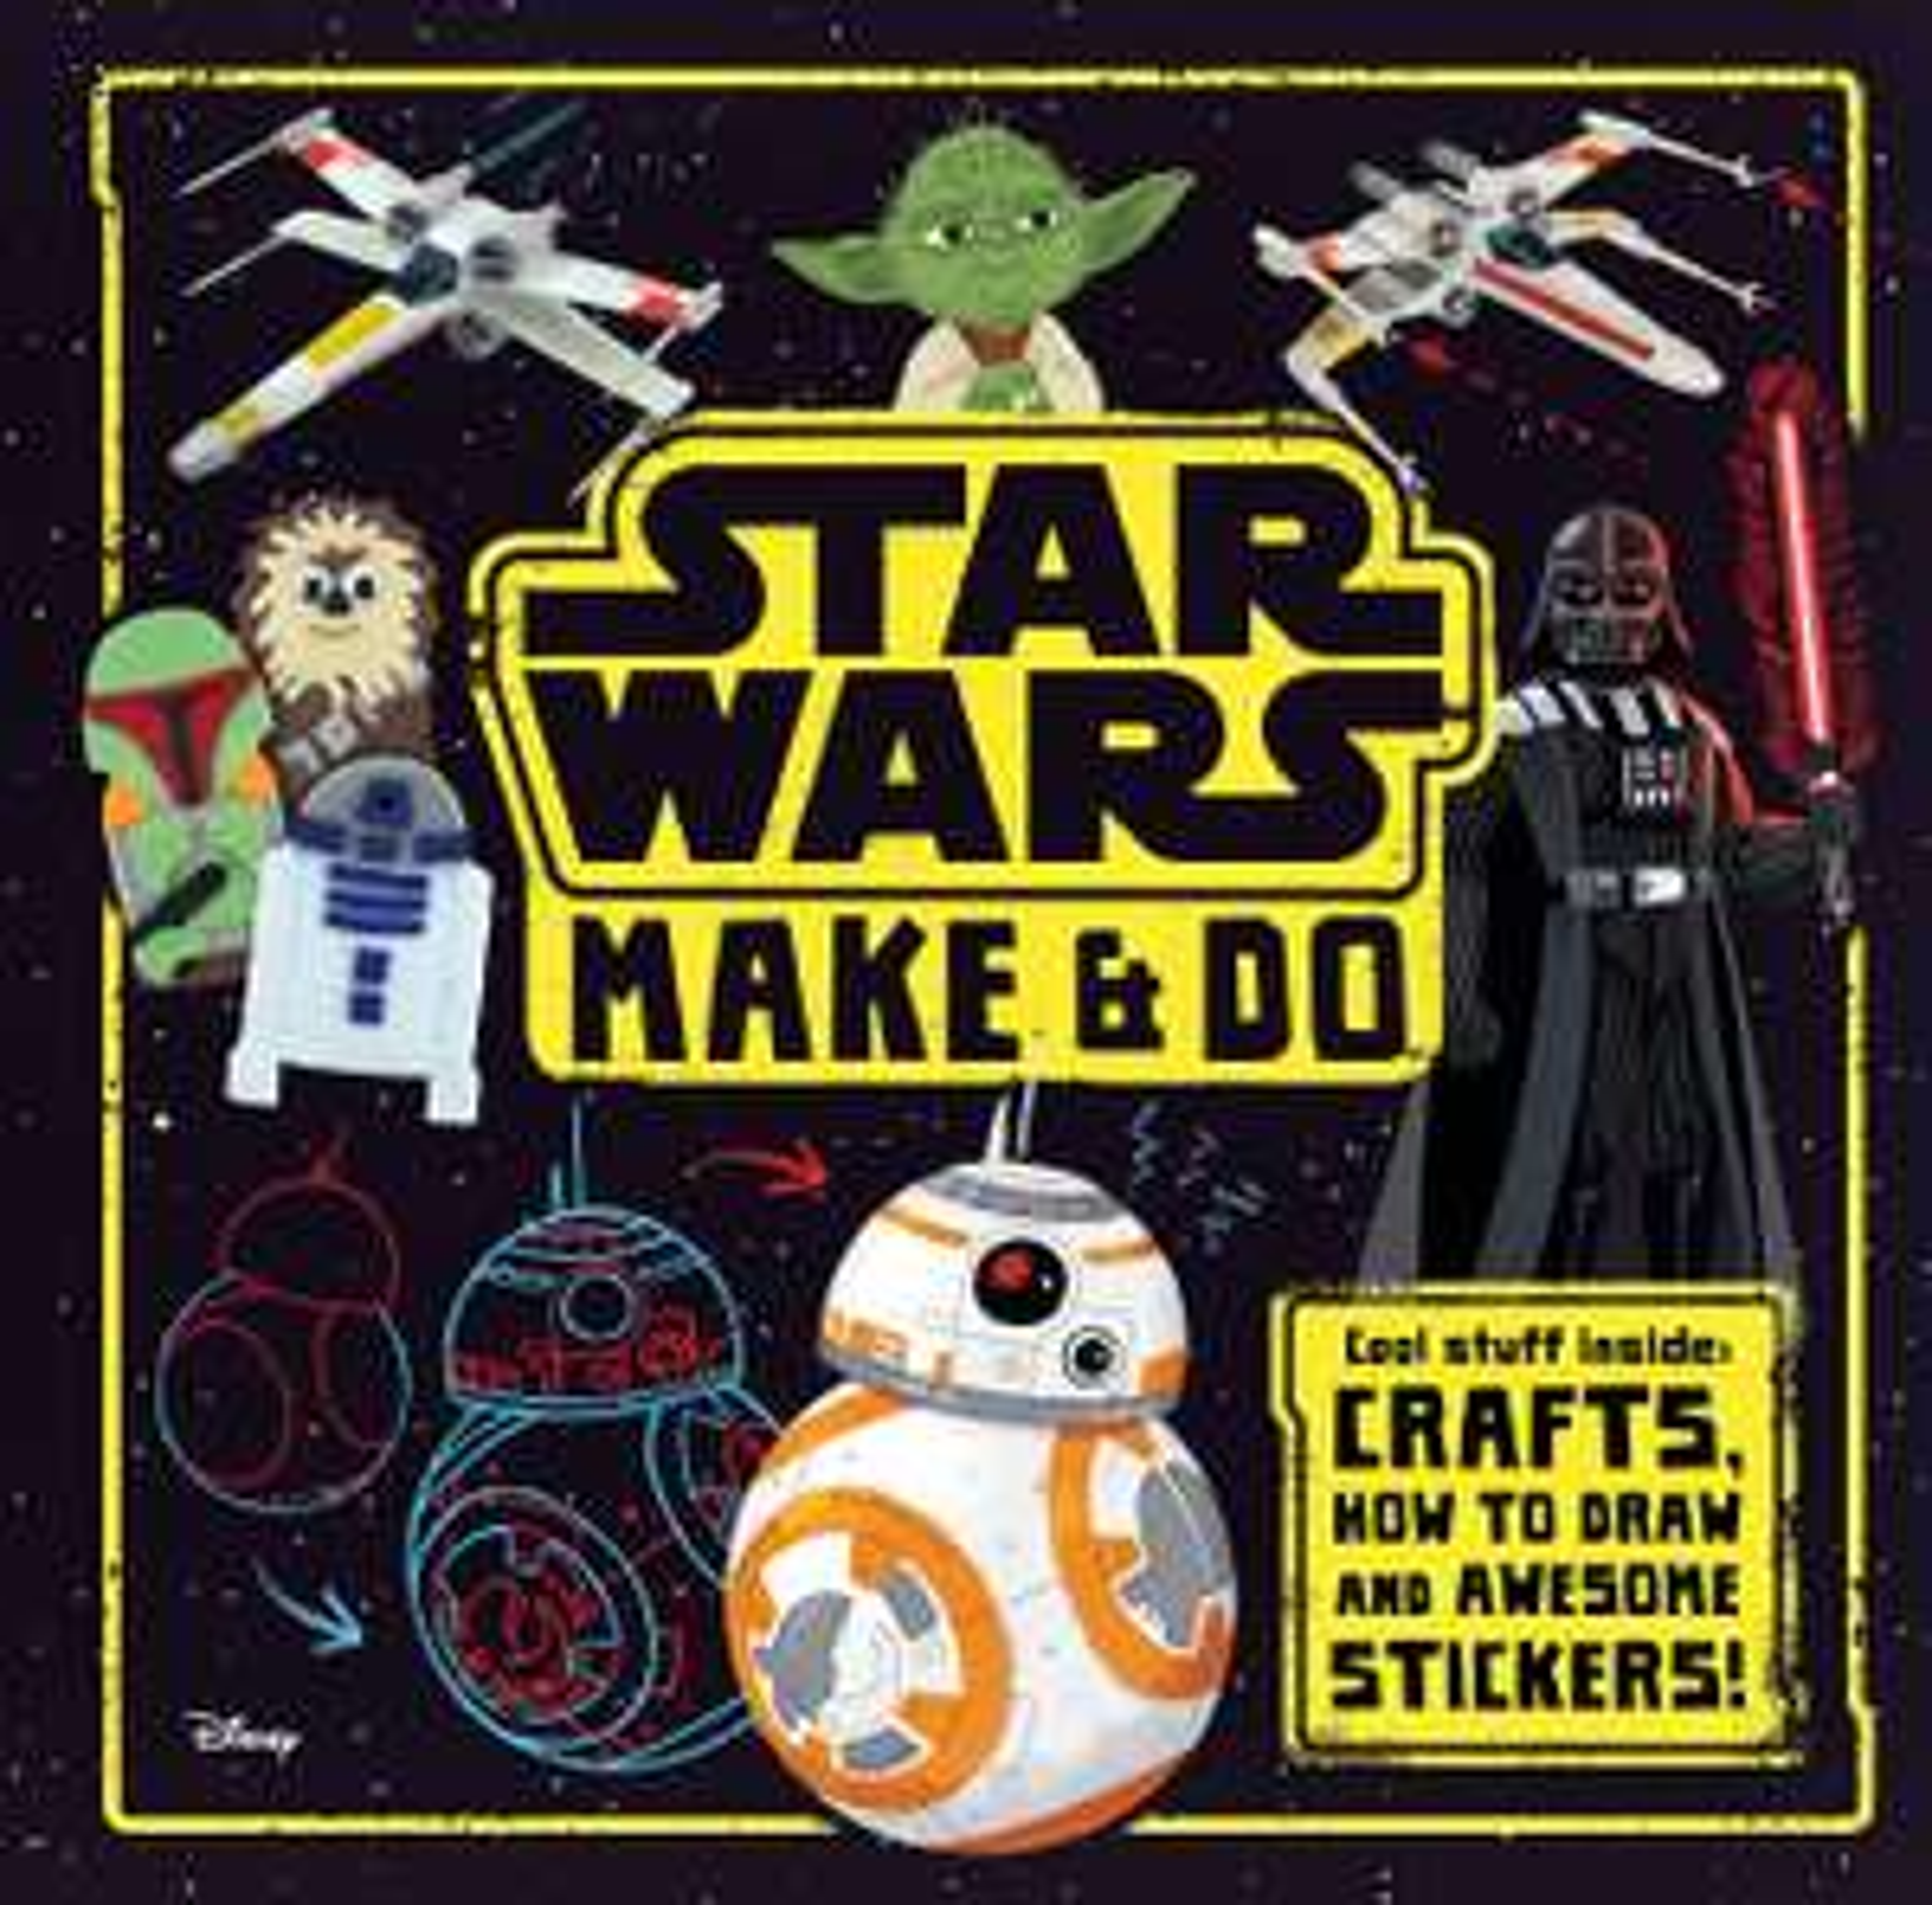 Star Wars Make & Do Book Or Star Wars Stationery Set, £1, In Store @ OneBelow, Argyle Street, Glasgow